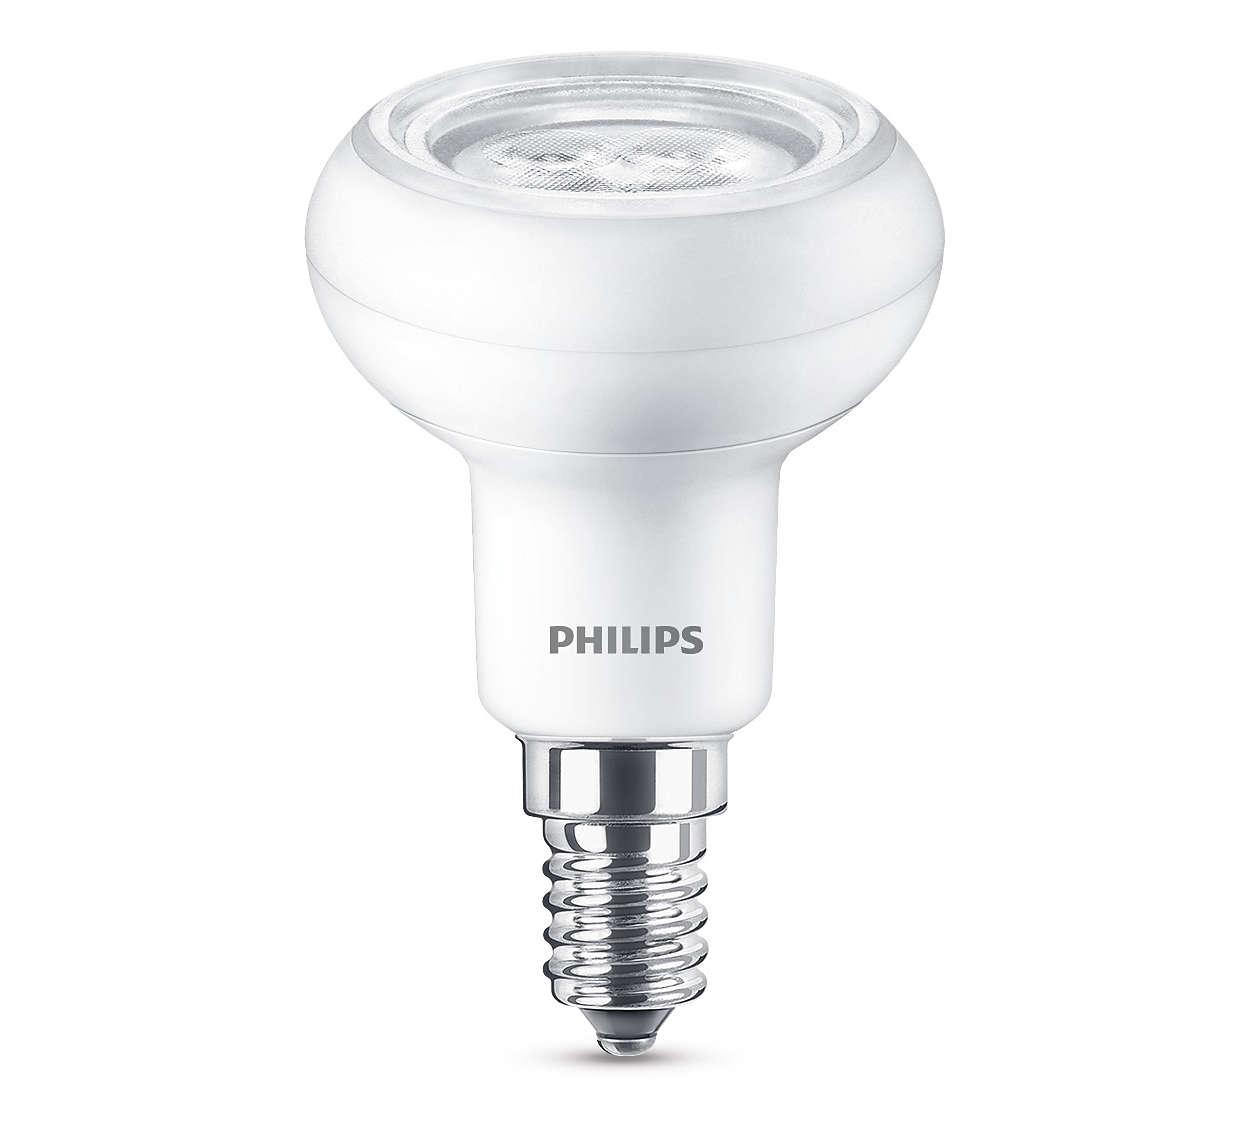 Langlebige LED-Lampe mit gerichtetem hellem Licht